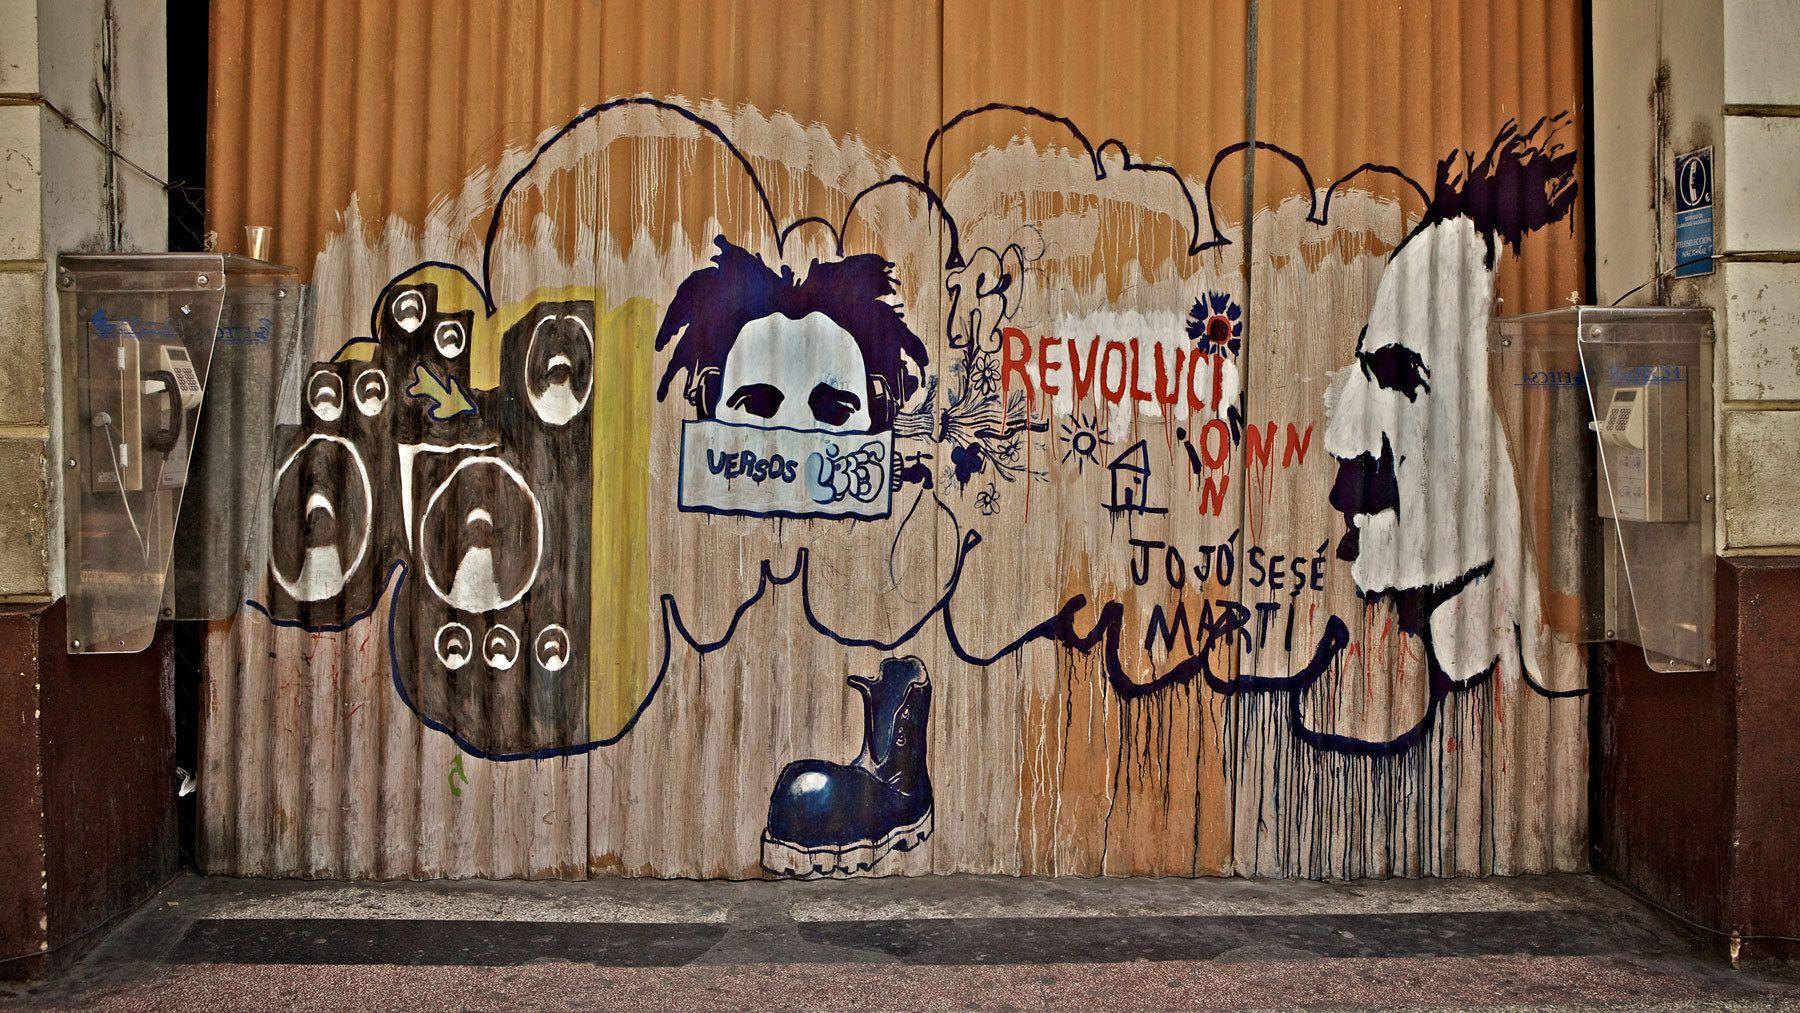 1jose_marti_street_art_havana_cuba.jpg